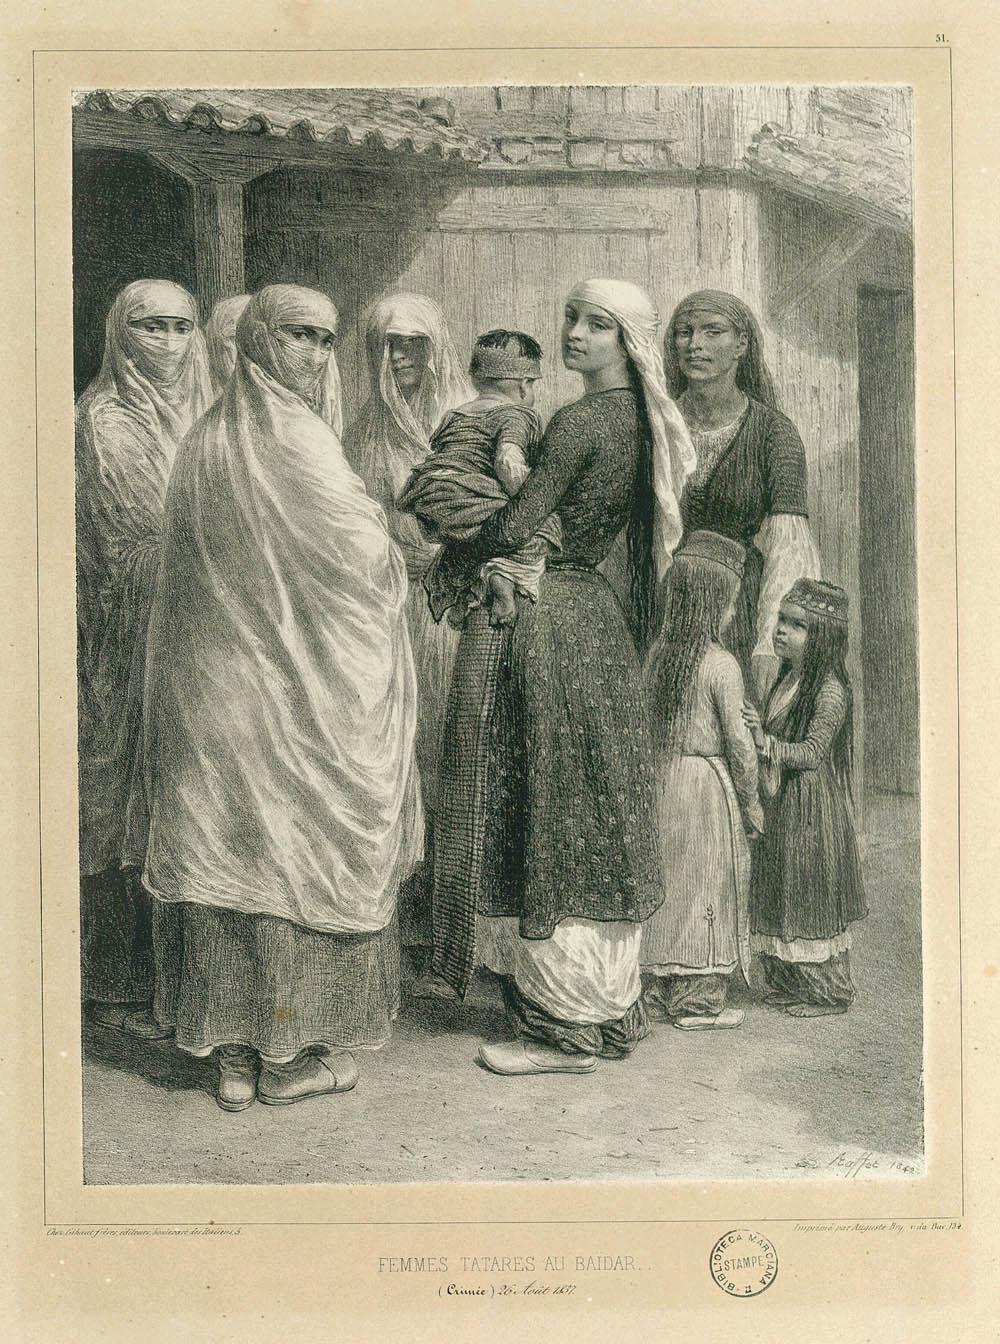 Татарские женщины из деревни Байдары. Картина Раффе, 1837 год